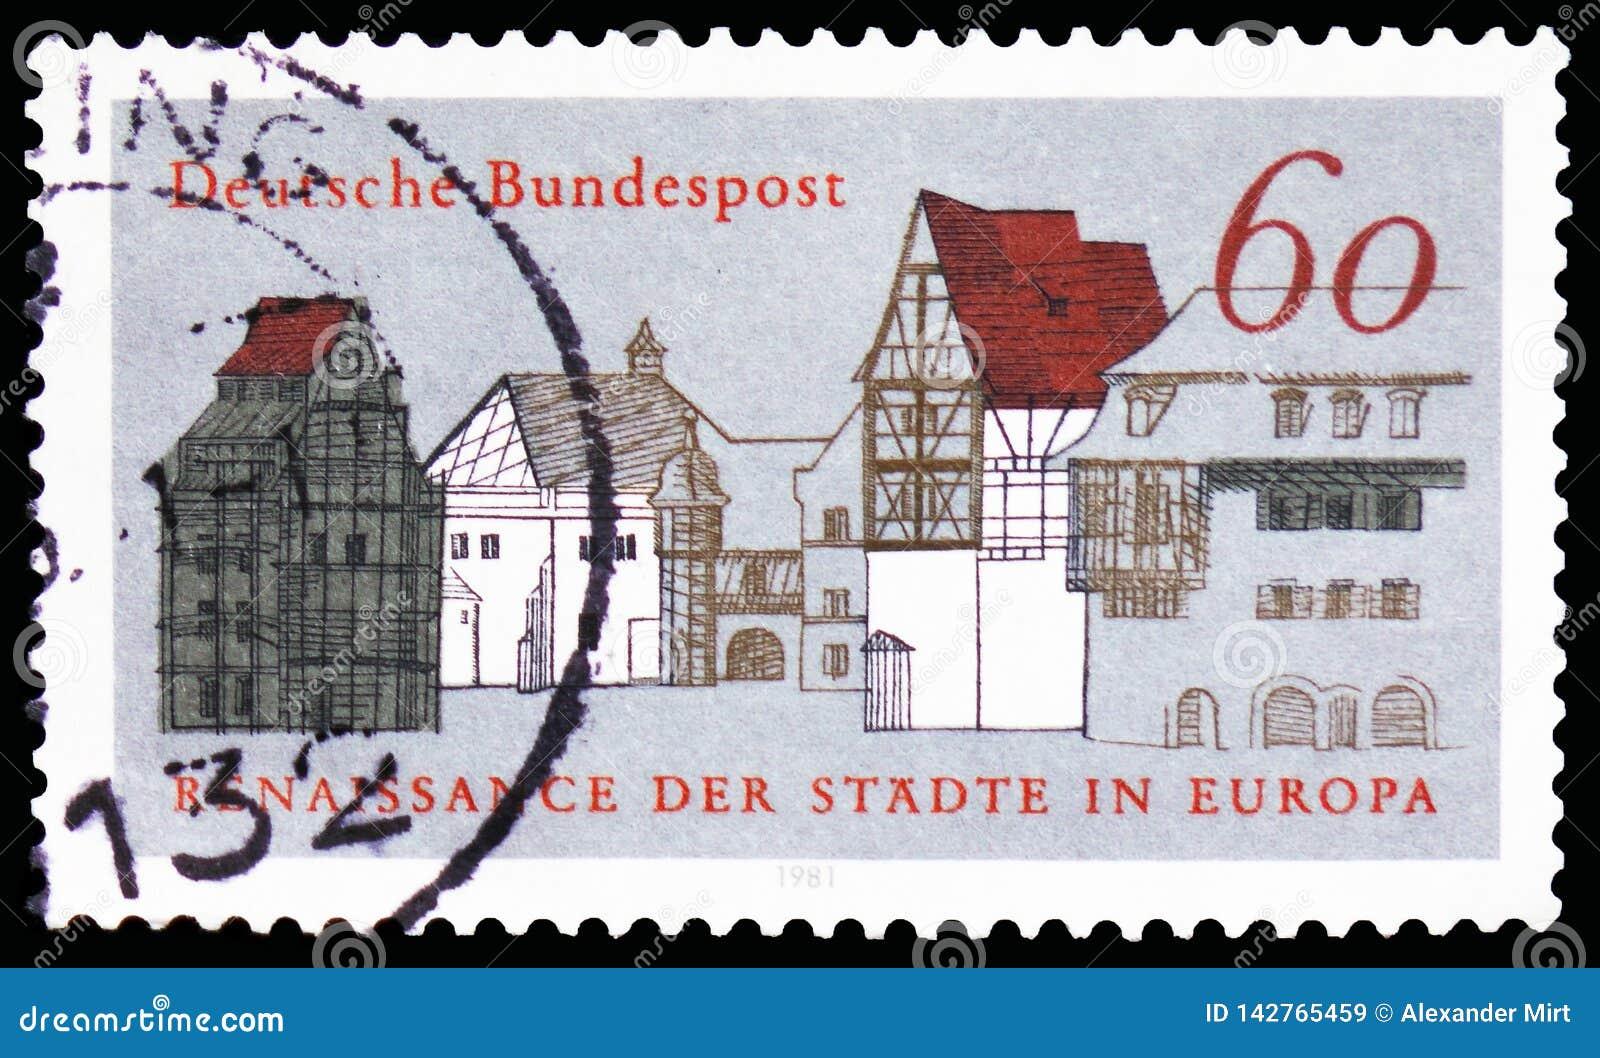 Old Town Houses, European Campaign for Urban Renaissance serie, circa 1981